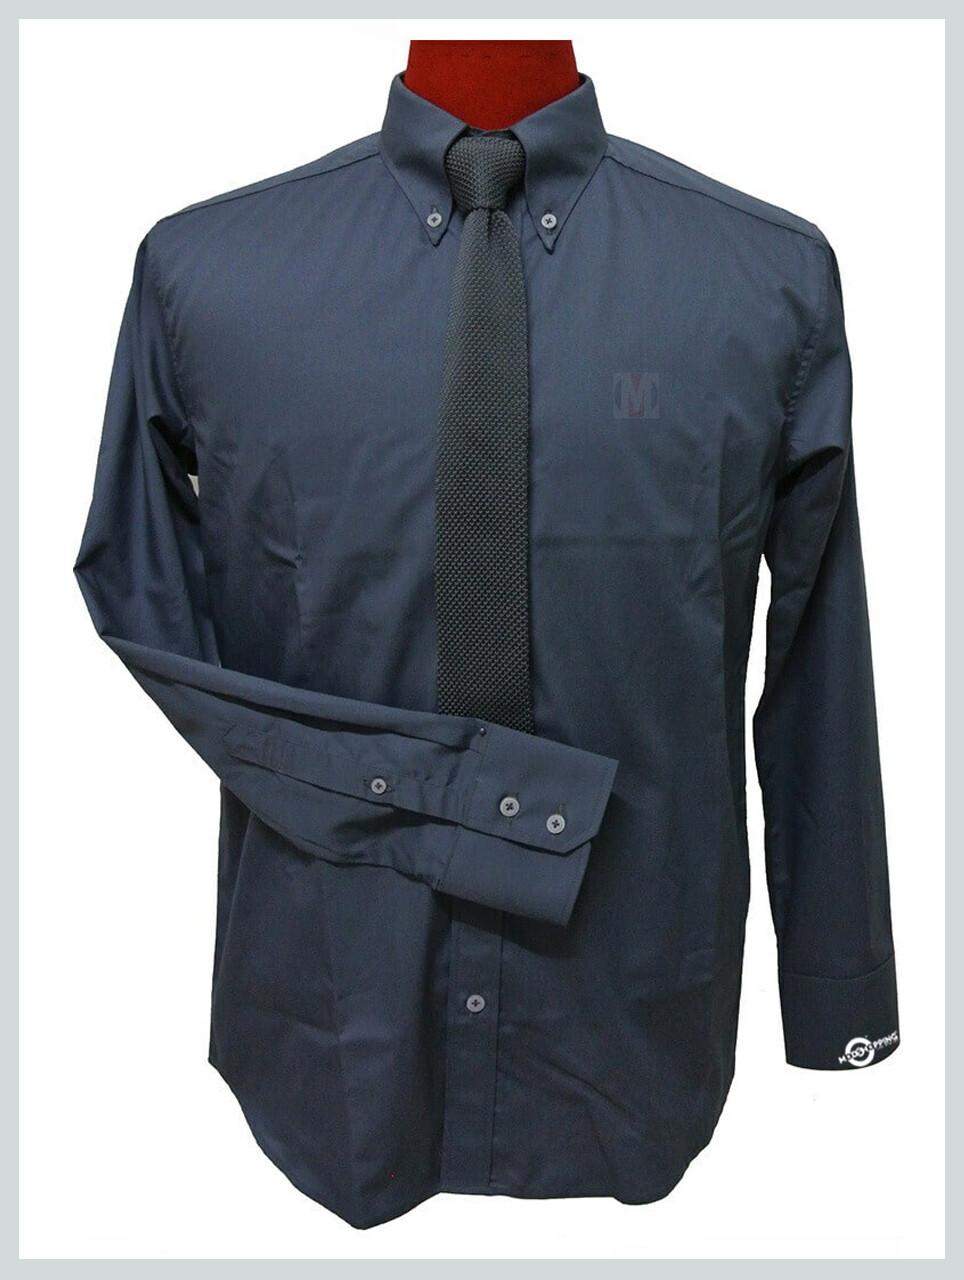 Grey Button Down Collar Shirt| 60s Mod Style